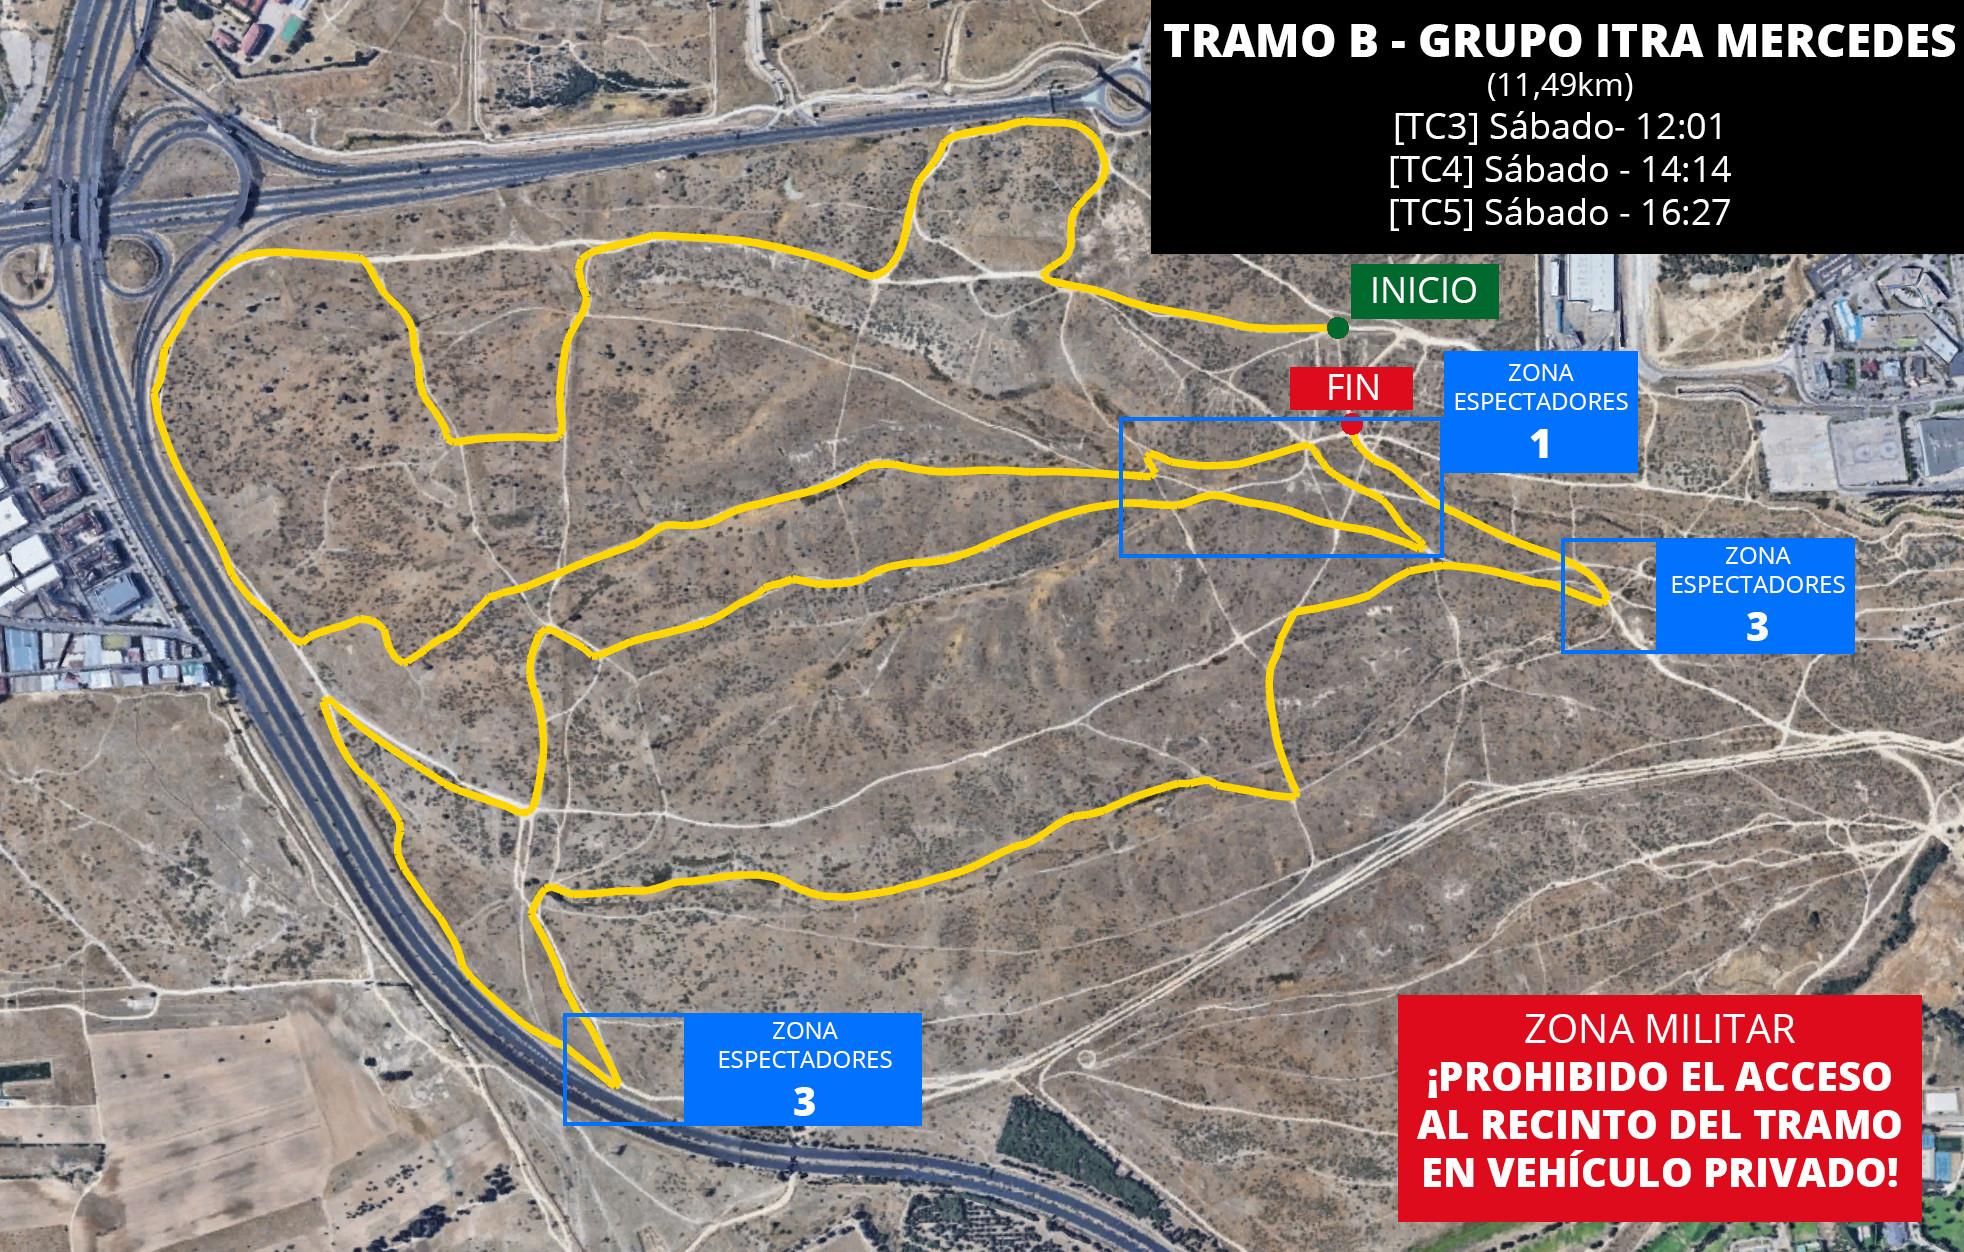 CERT: 2º Rallye de Tierra de Madrid [29-30 Noviembre] TC-B-GRUPO-ITRA